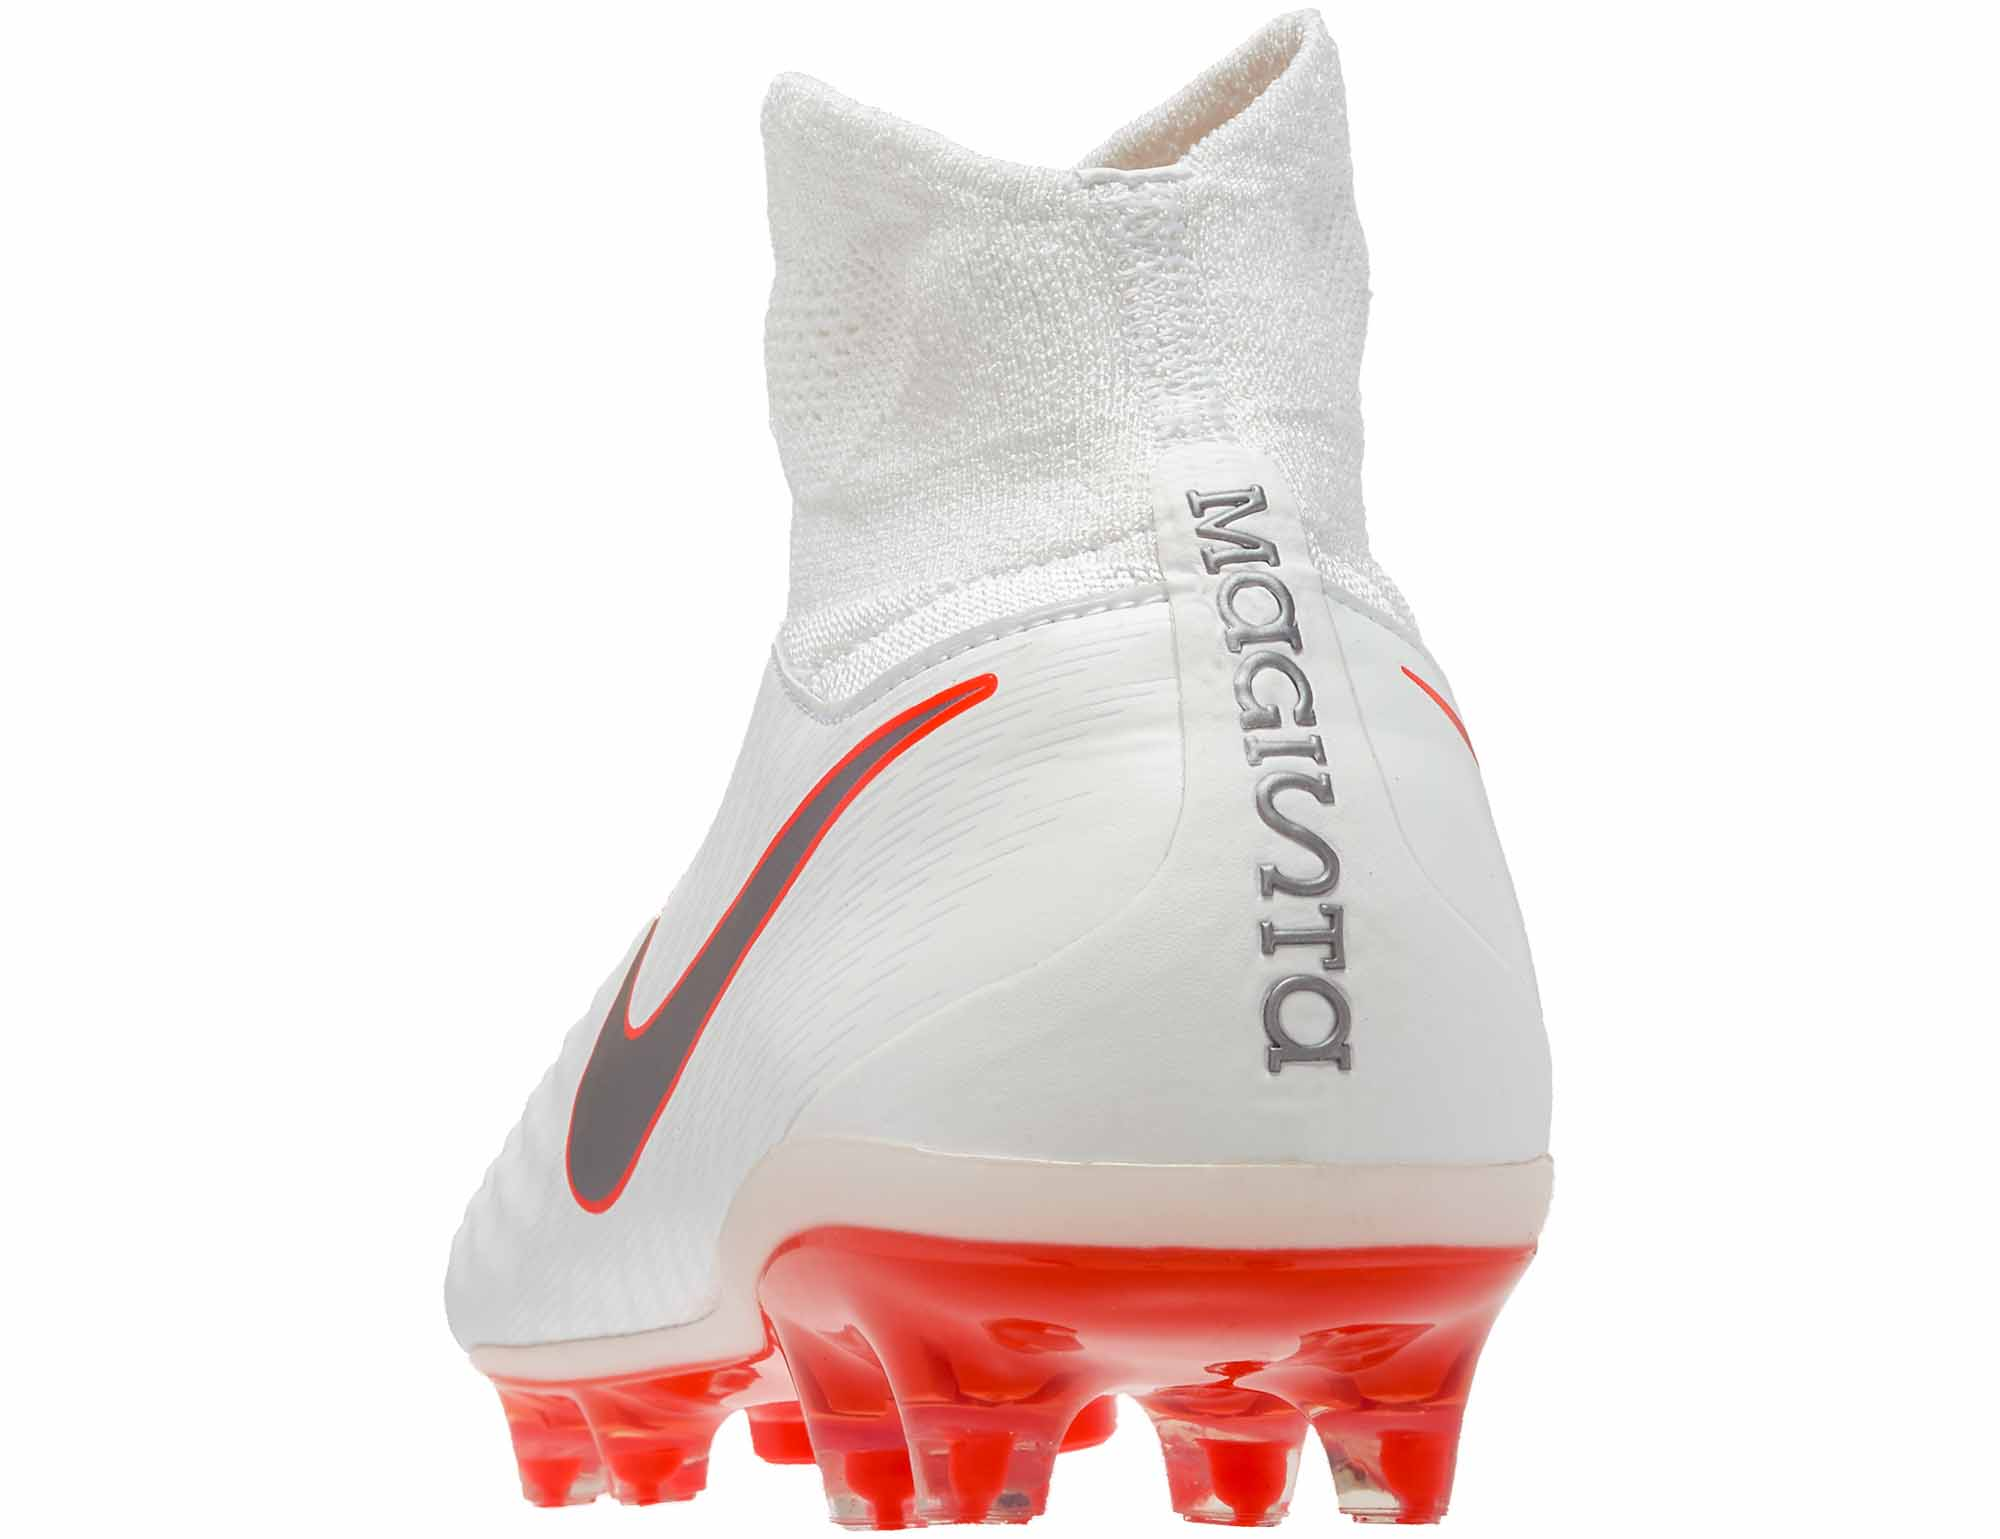 Nike Magista Obra II FG Cleats [White] (8.5) .com